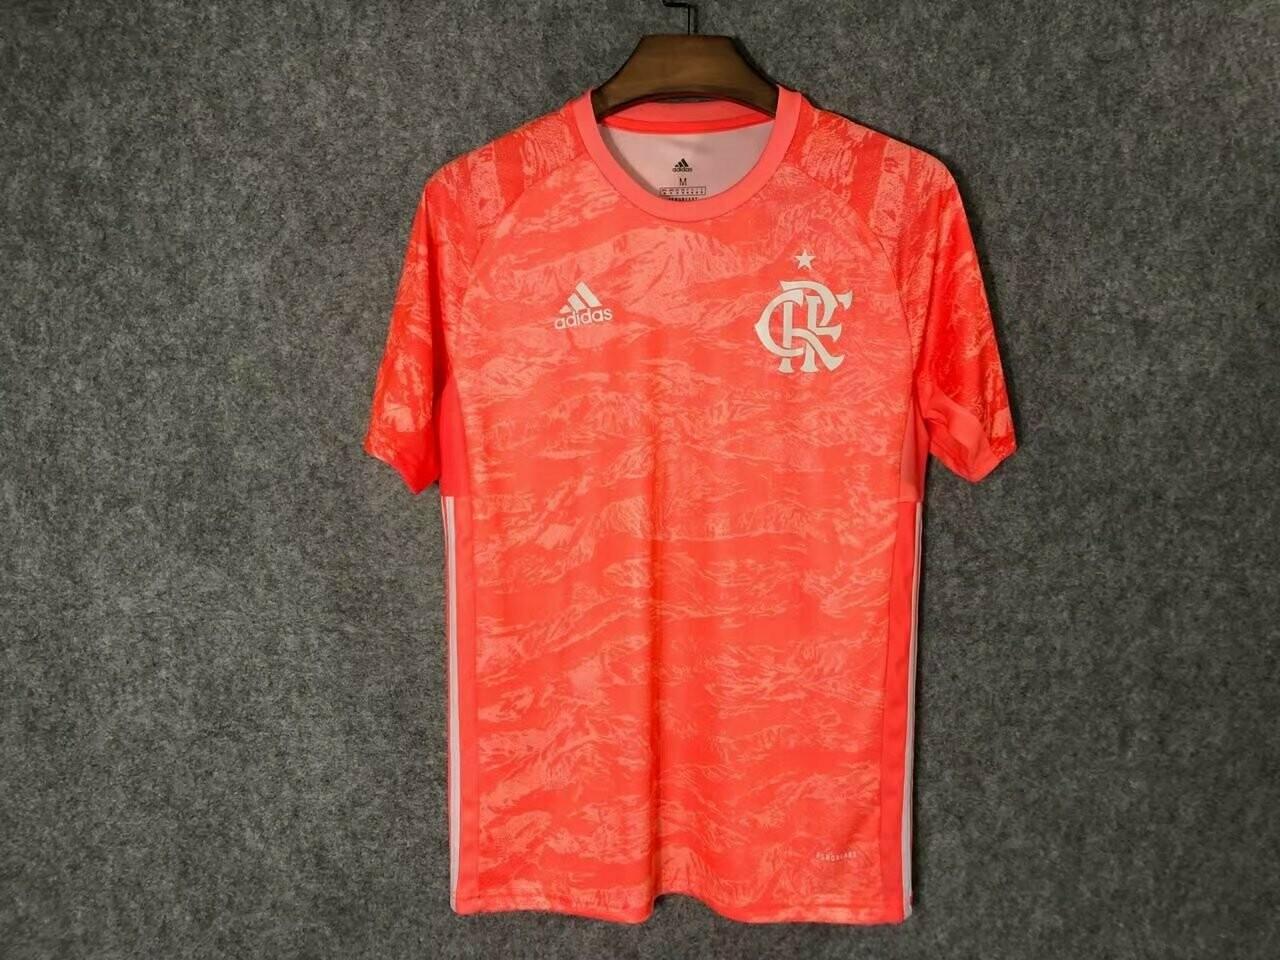 Camisa de Goleiro Flamengo  Torcedor Adidas Masculina